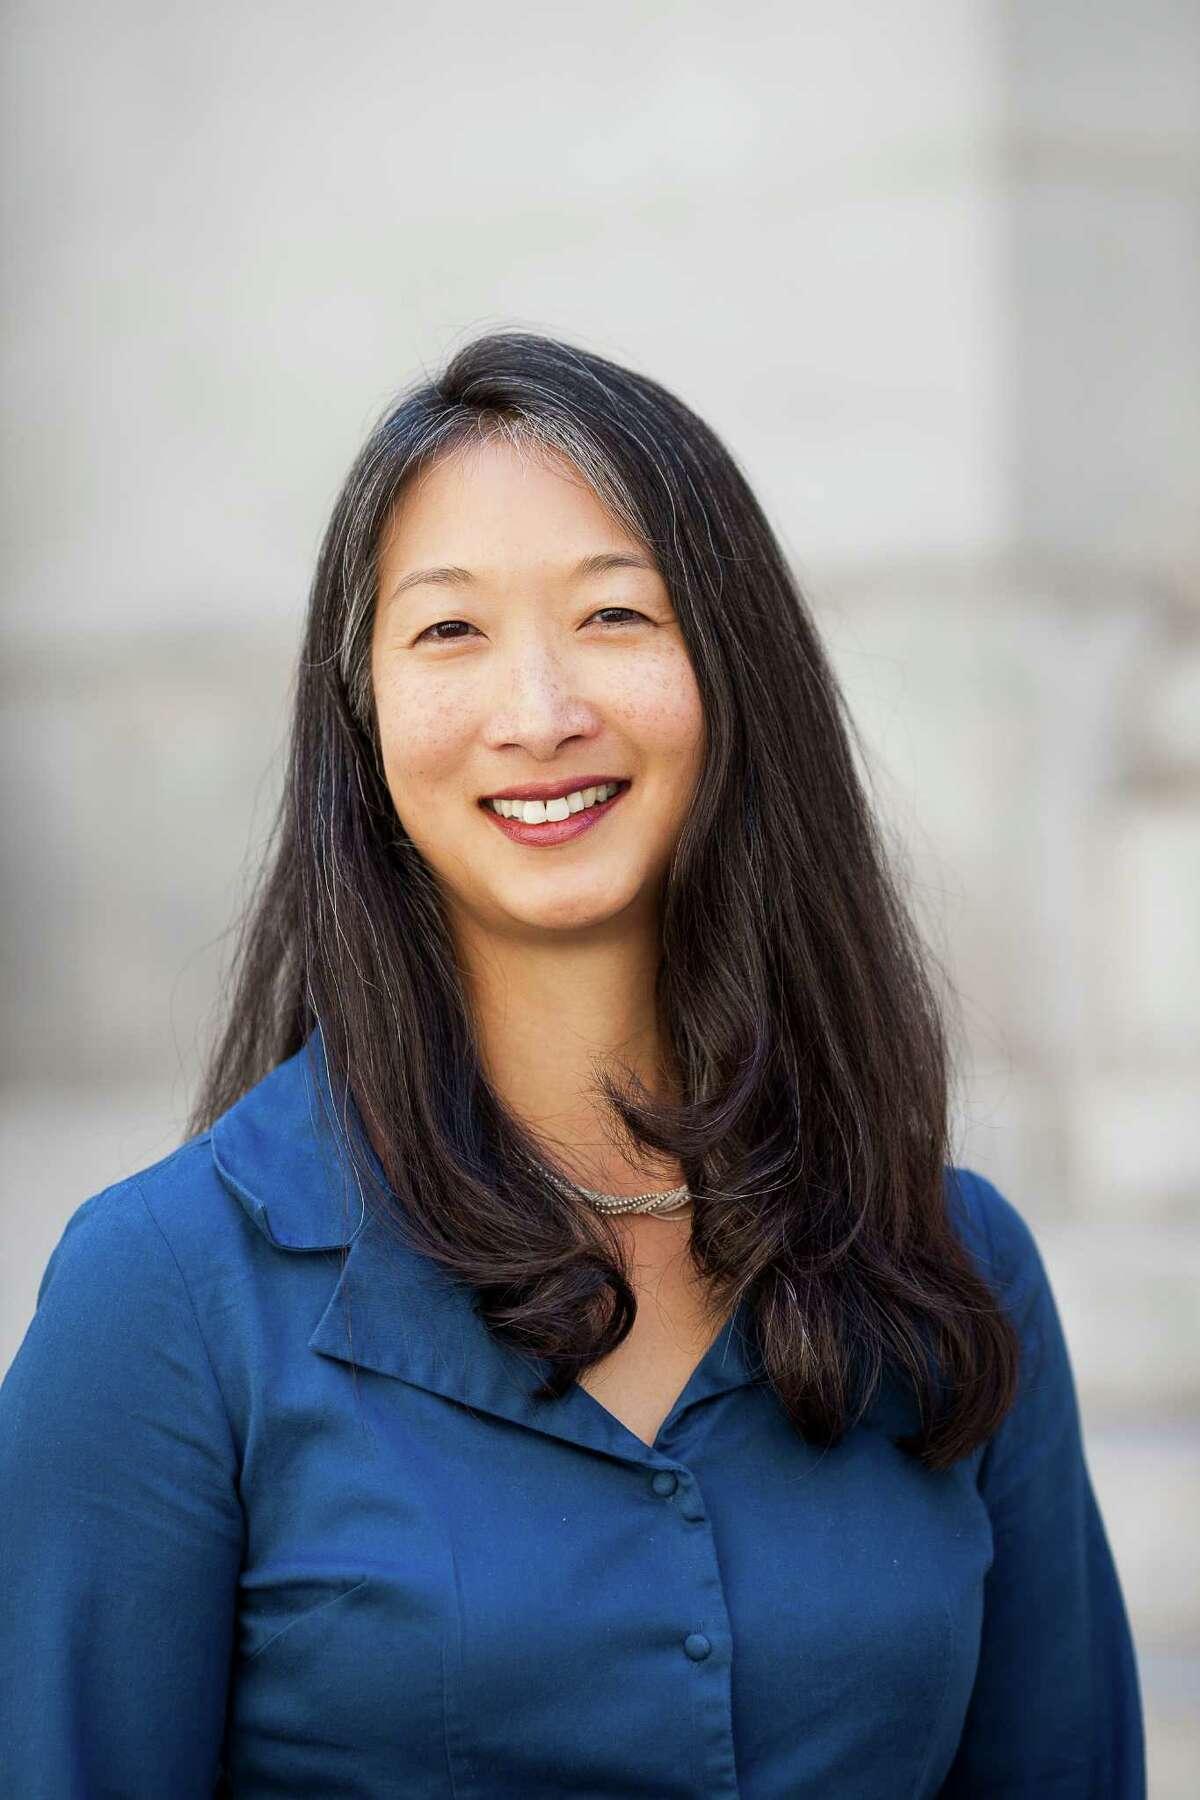 Elance-oDesk appointed Daphne Li to senior vice president of enterprise. Headshot portraits for Convo